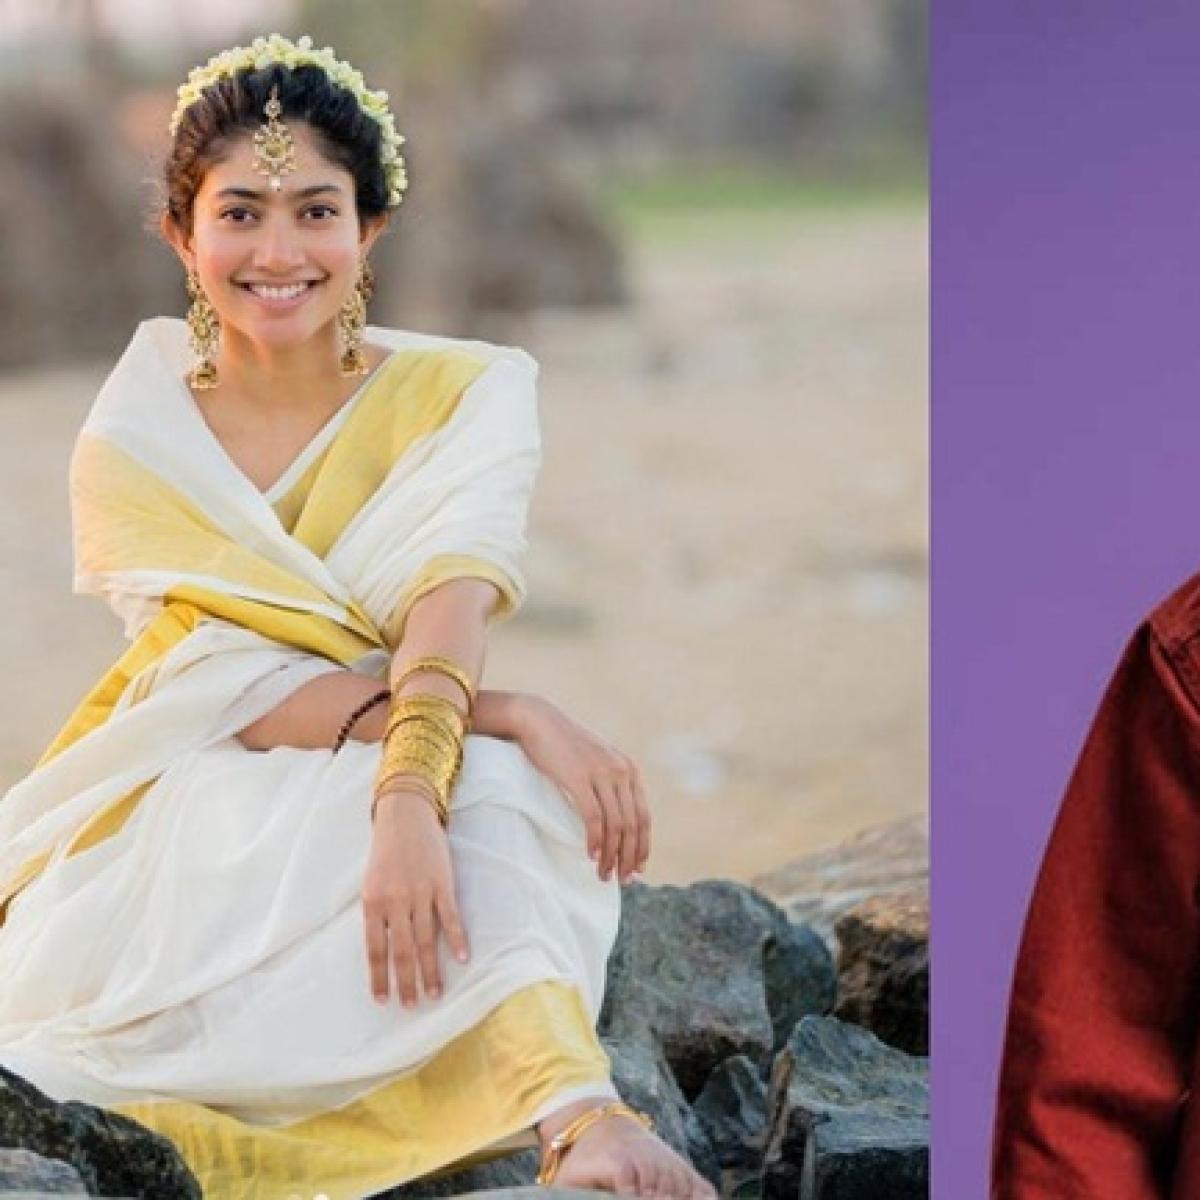 Forbes India's '30 under 30': Actress Sai Pallavi, YouTuber Bhuvan Bam make it to the list